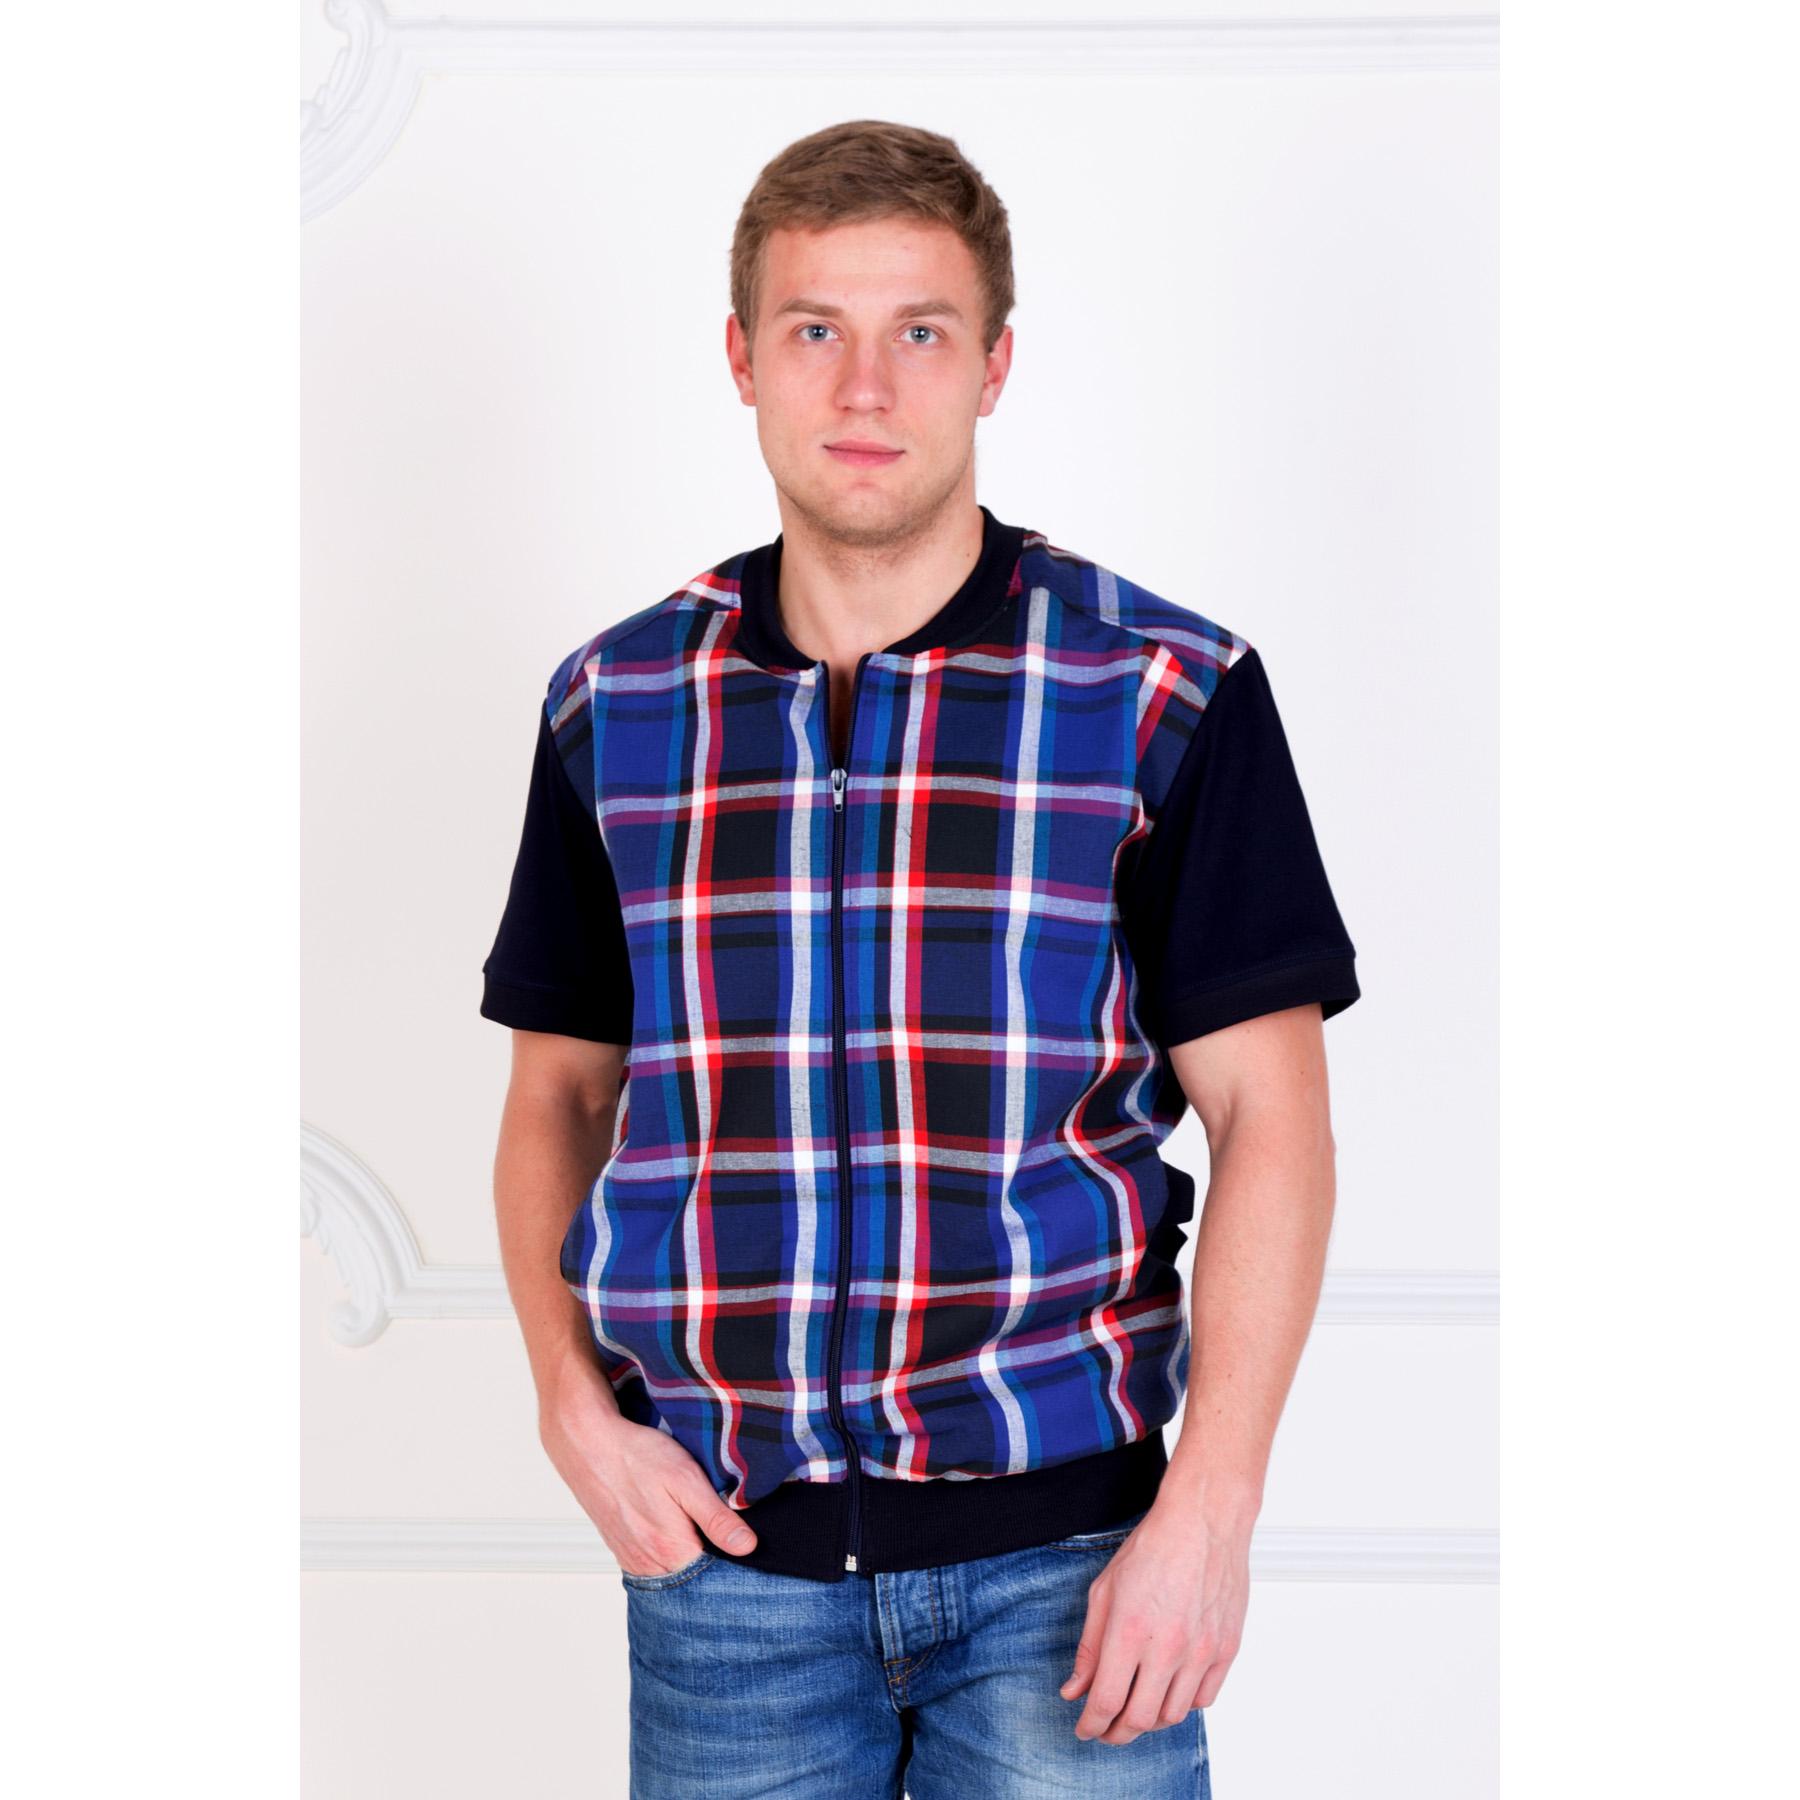 Мужская рубашка «Аполлон» , размер 44Рубашки<br>Обхват груди: 88 см <br>Обхват талии: 78 см <br>Обхват бедер: 94 см <br>Рост: 170-176 см<br><br>Тип: Муж. рубашка<br>Размер: 44<br>Материал: Шотландка